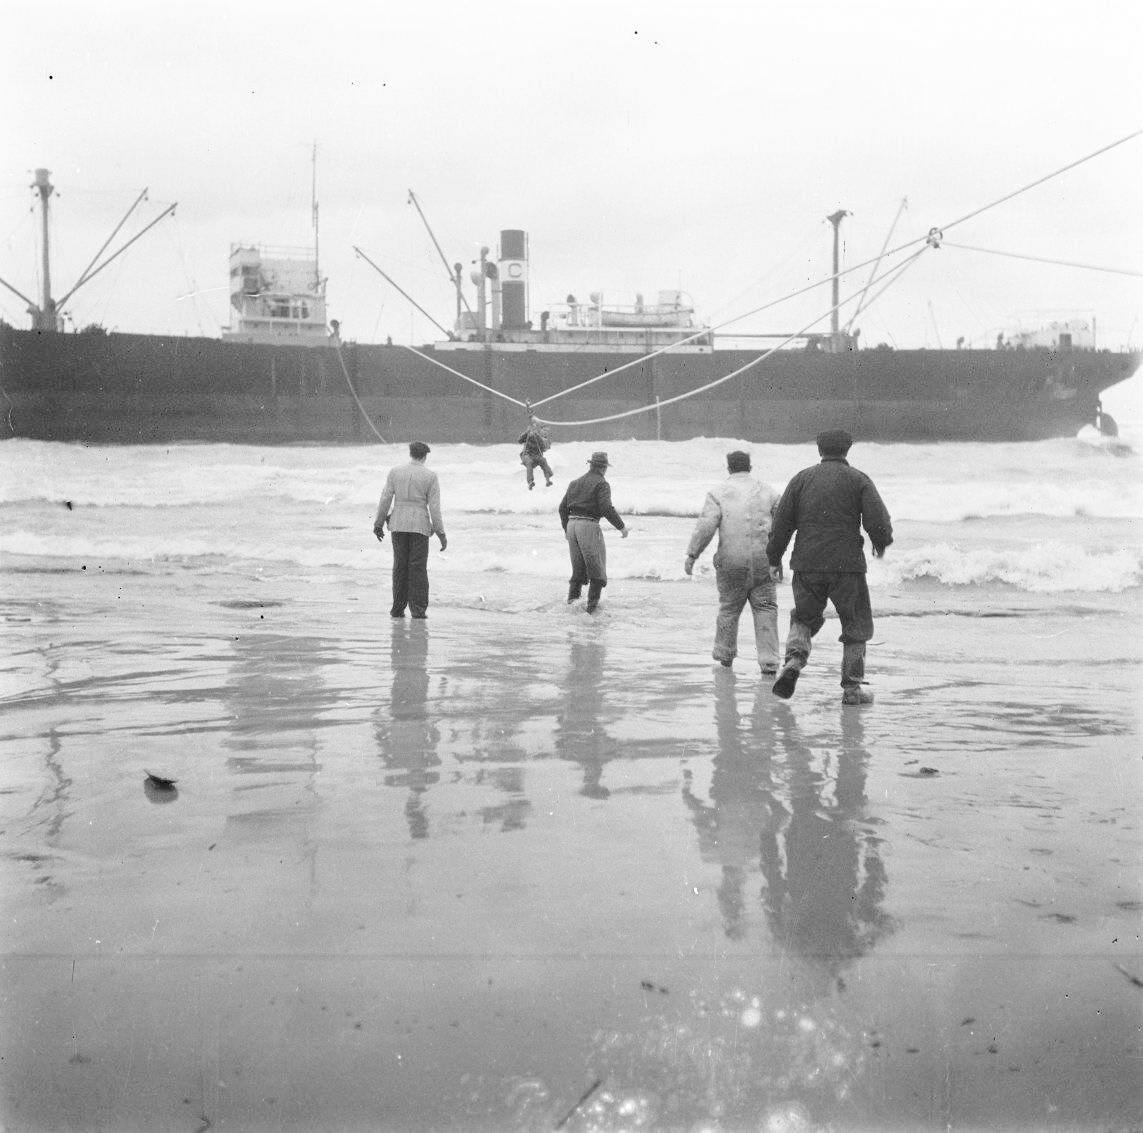 COLORIZING HISTORY: illegal immigration boat ״Parita